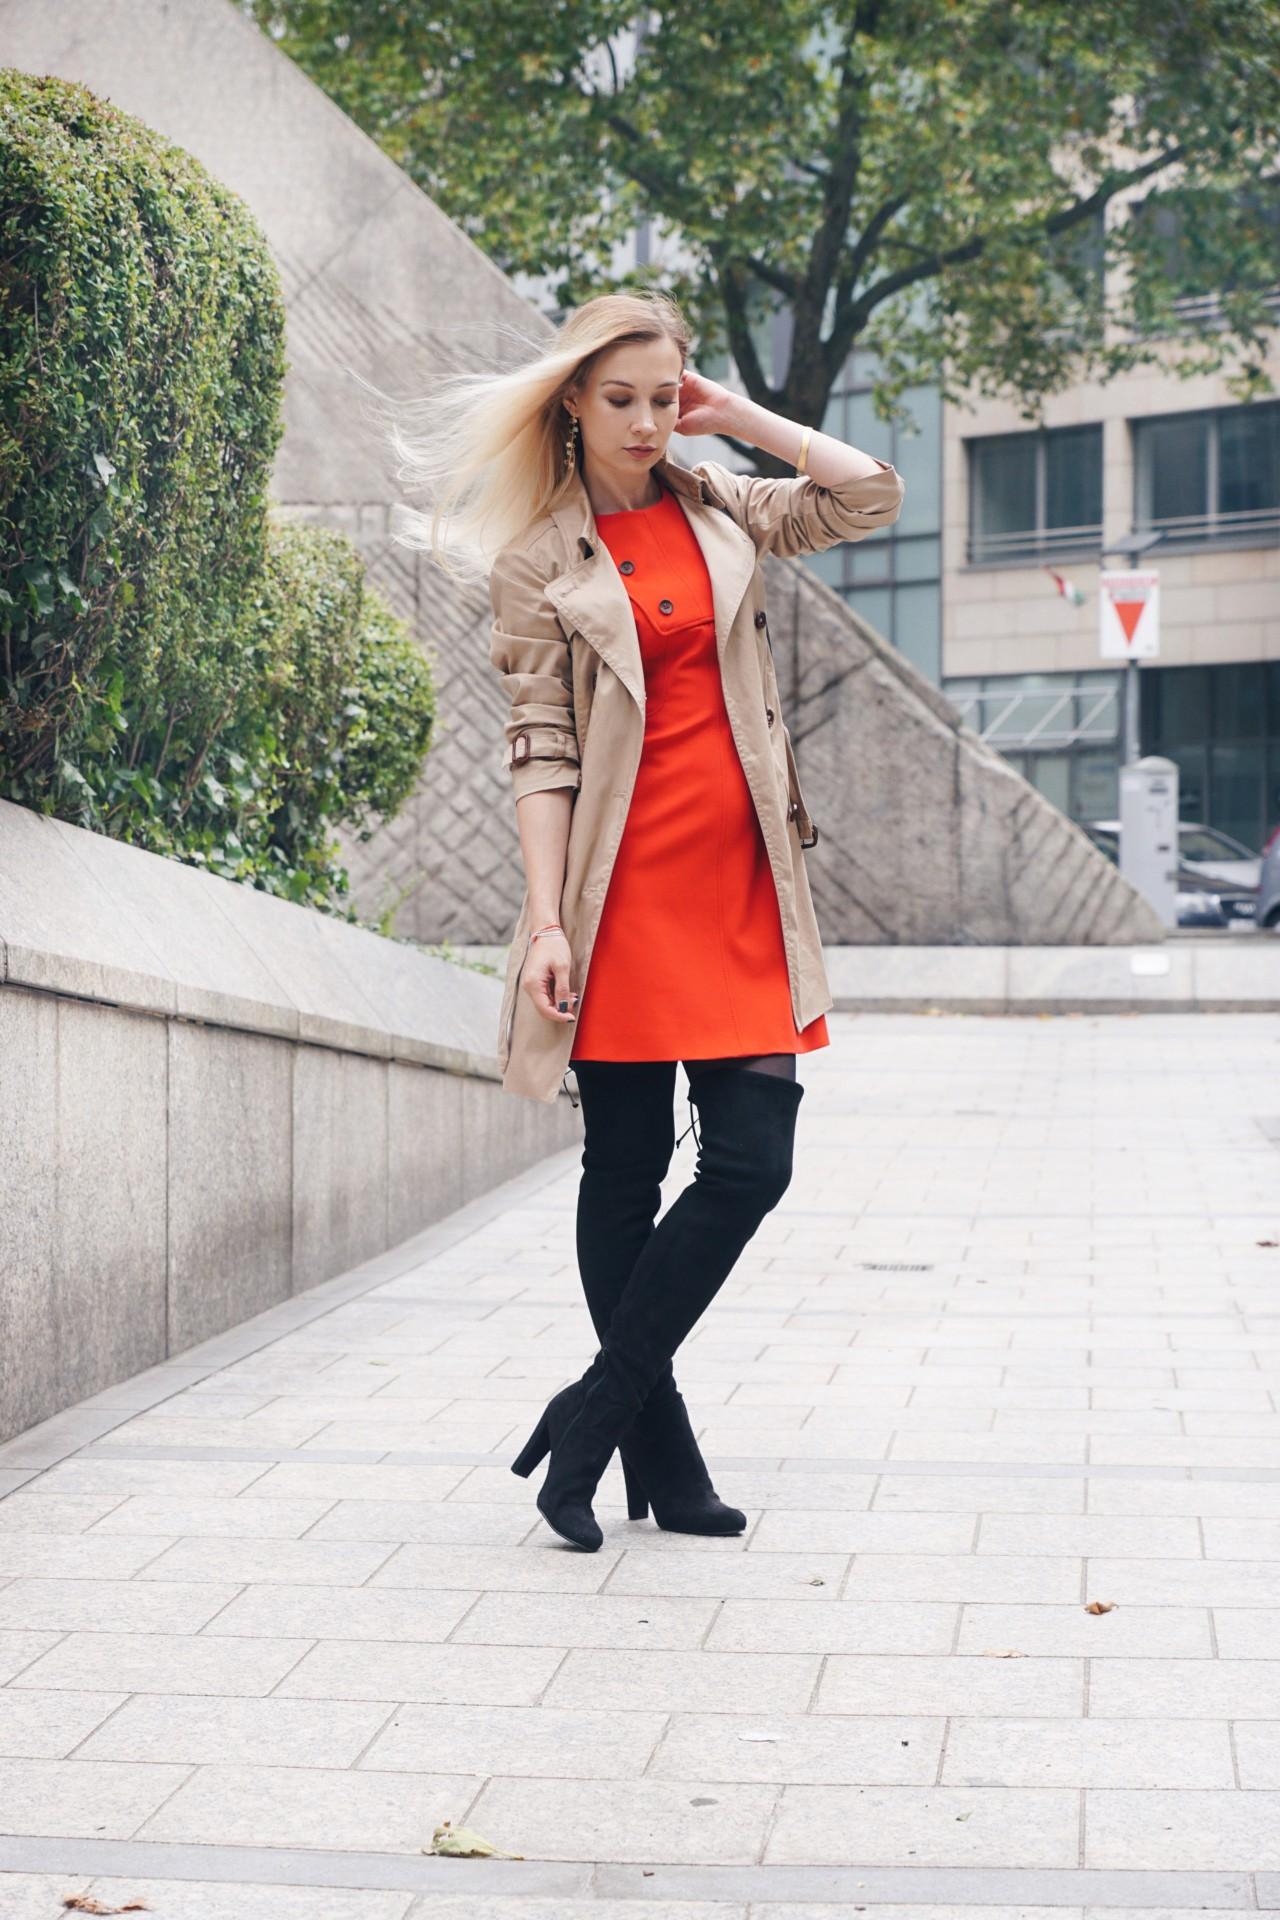 streetstyle_dbkstylez_trenchcoat_fashion_blog_mode_modeblog_стиль_мода_фэшн